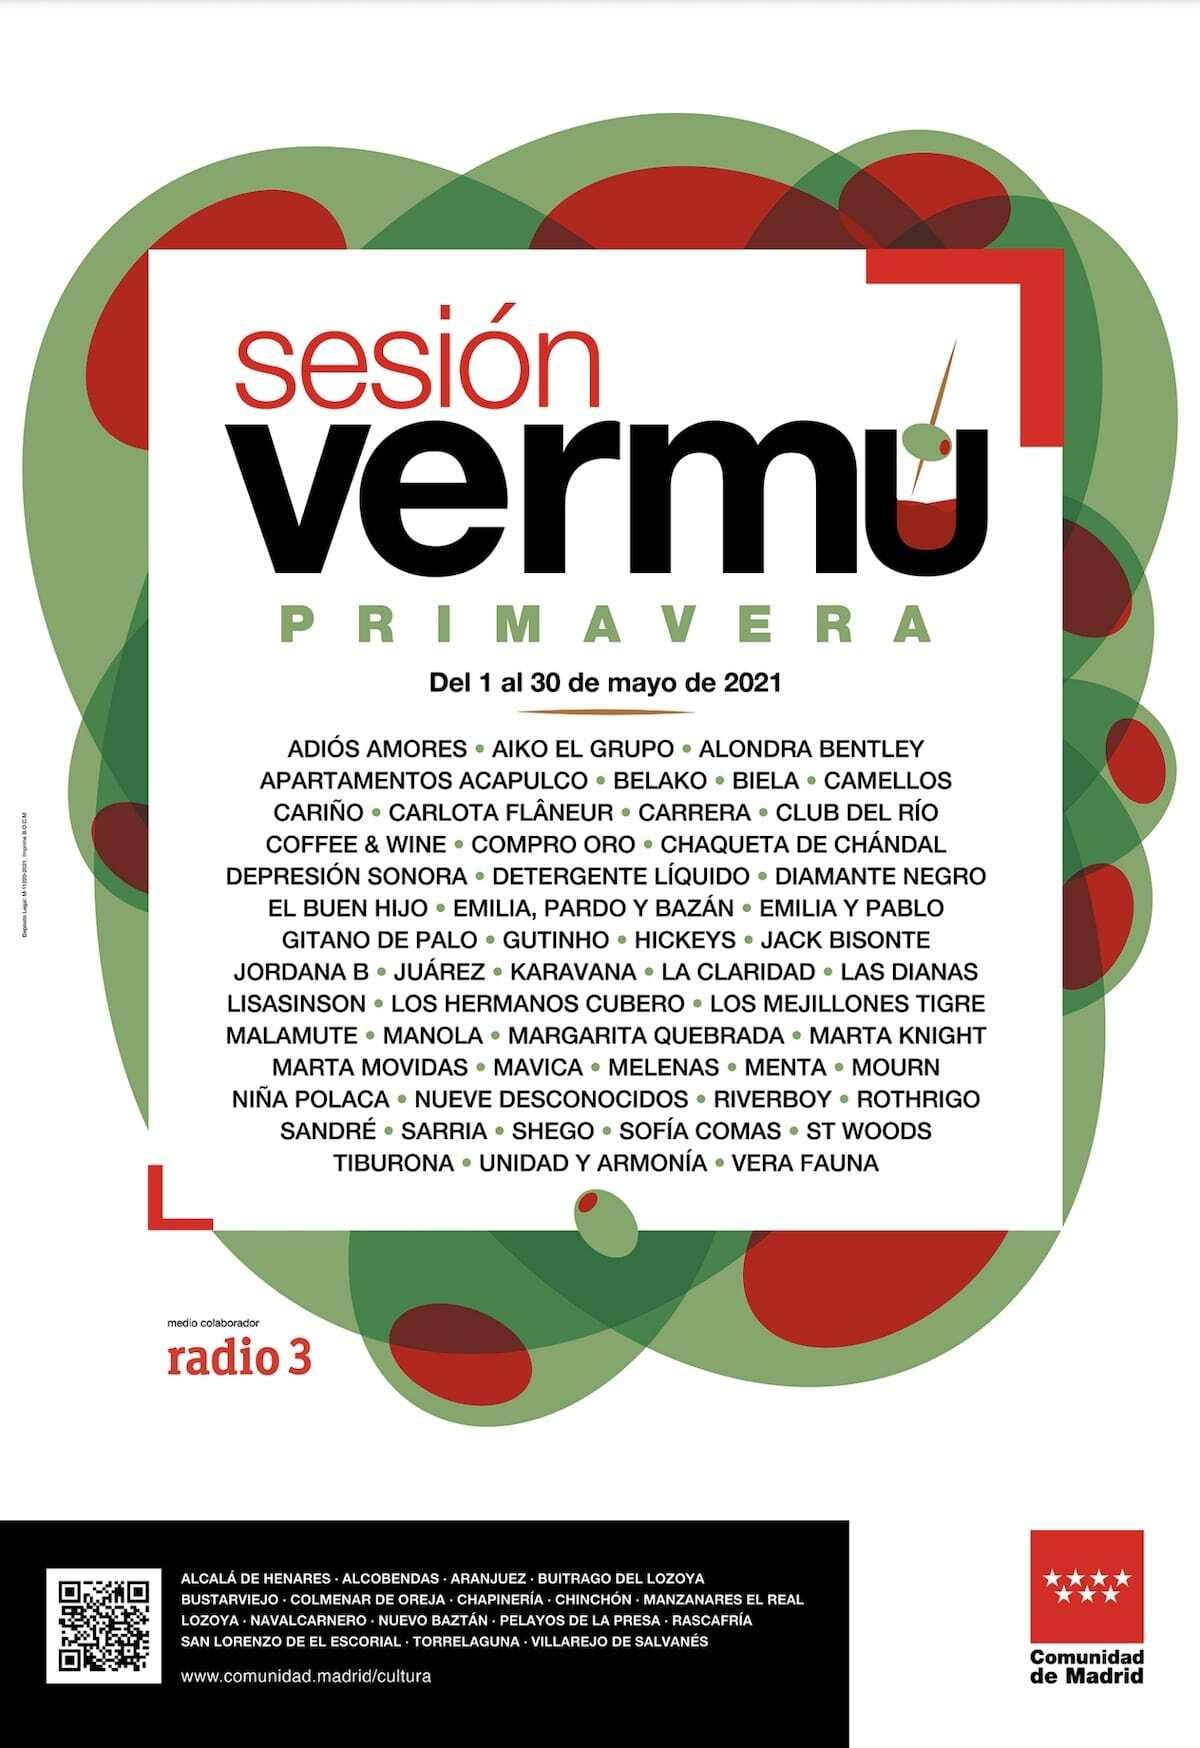 Sesion Vermut, Primavera 2021